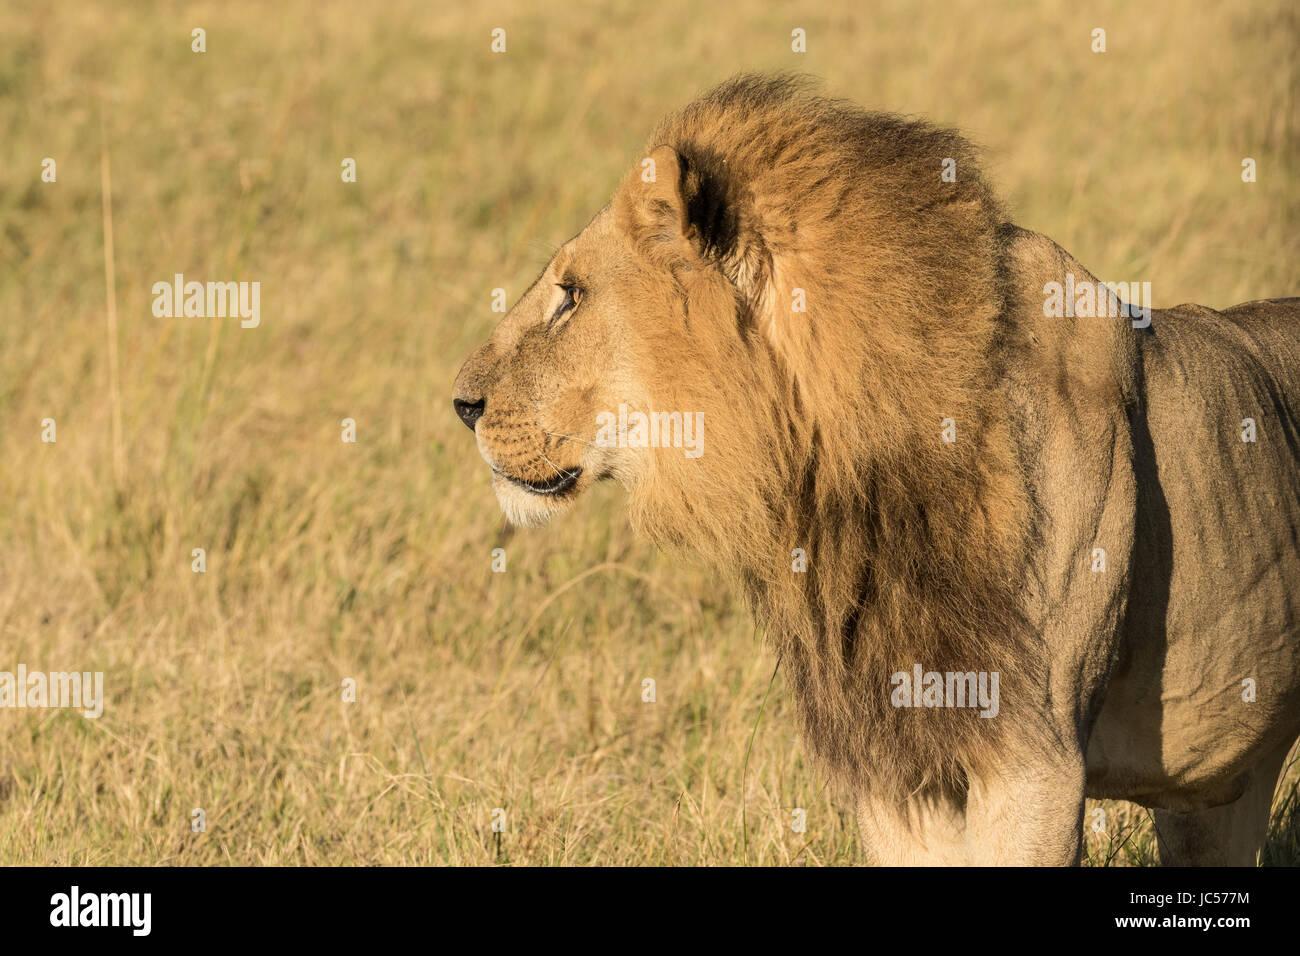 Lion profile - Stock Image